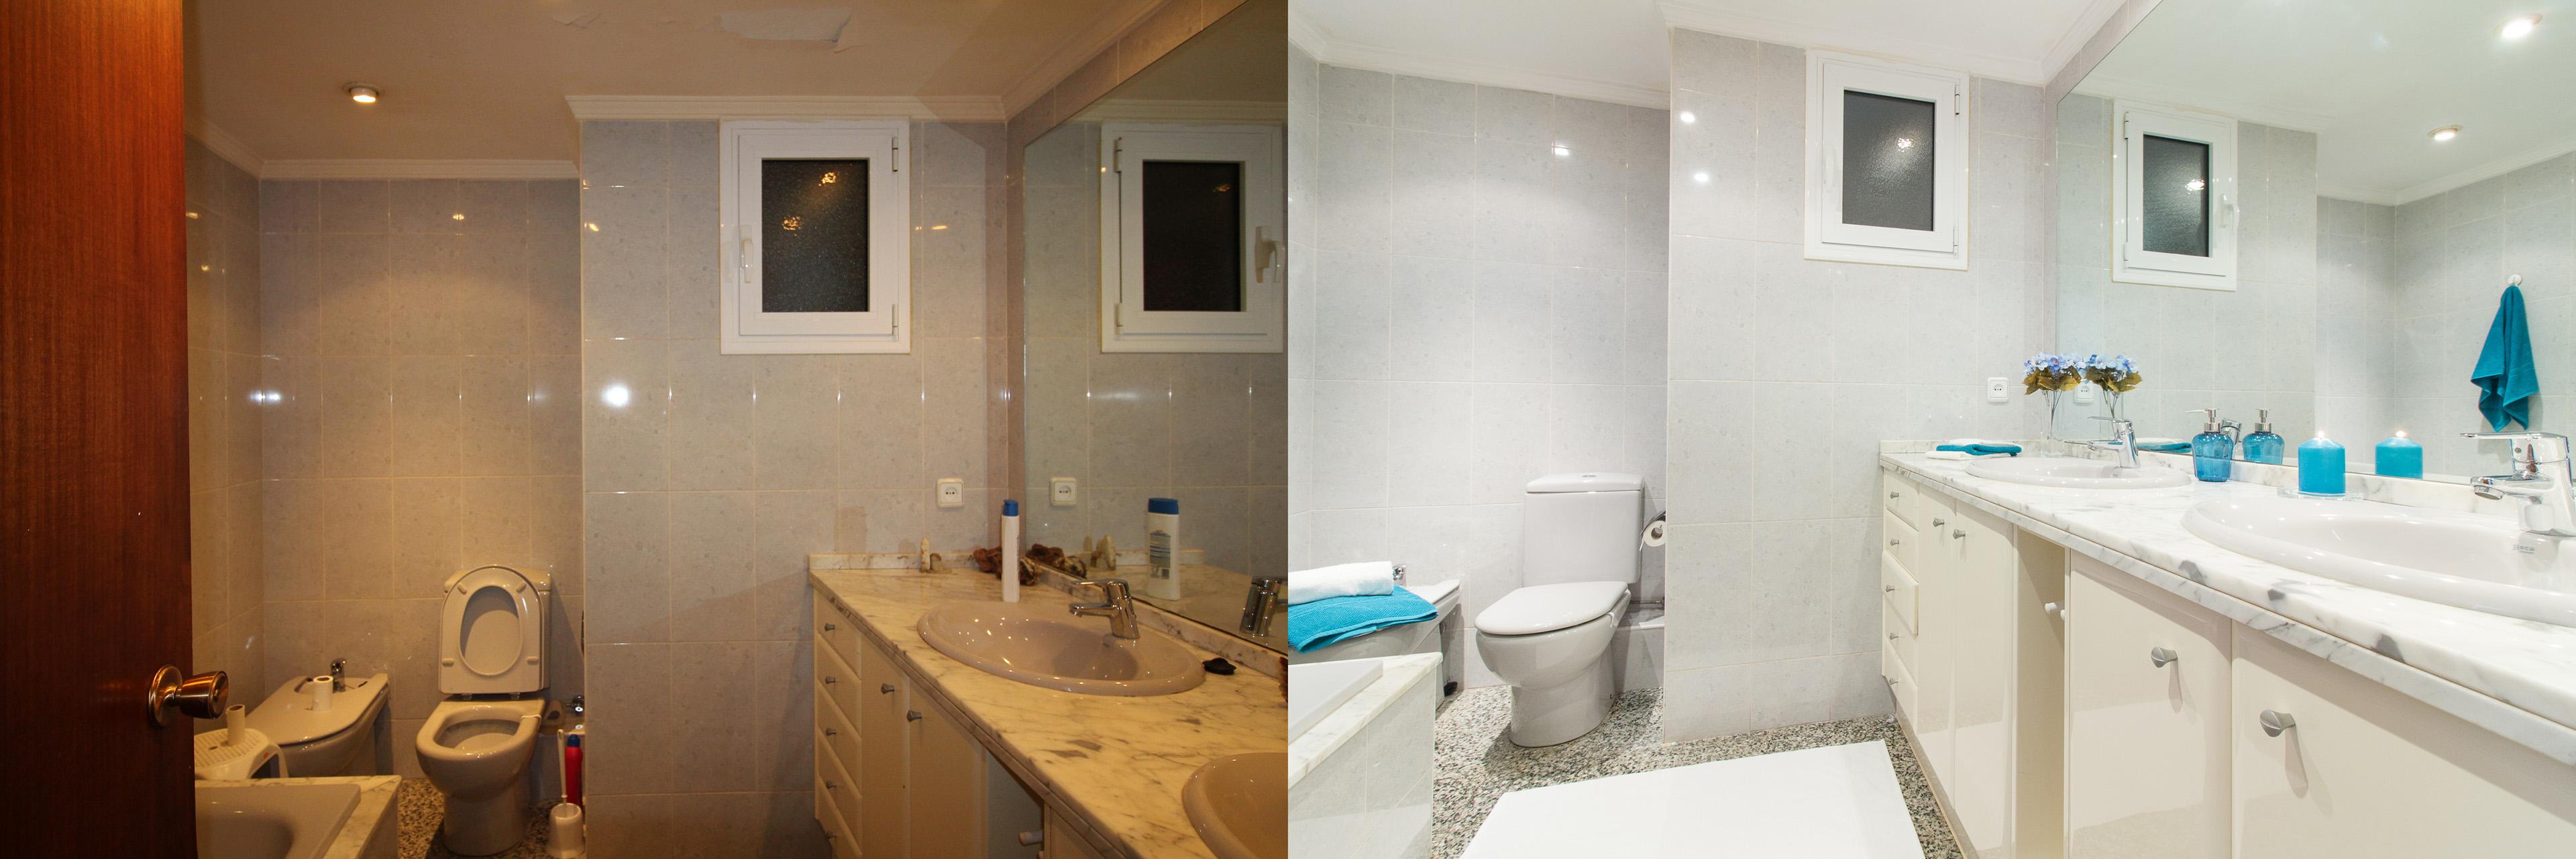 Home staging barcelona baño